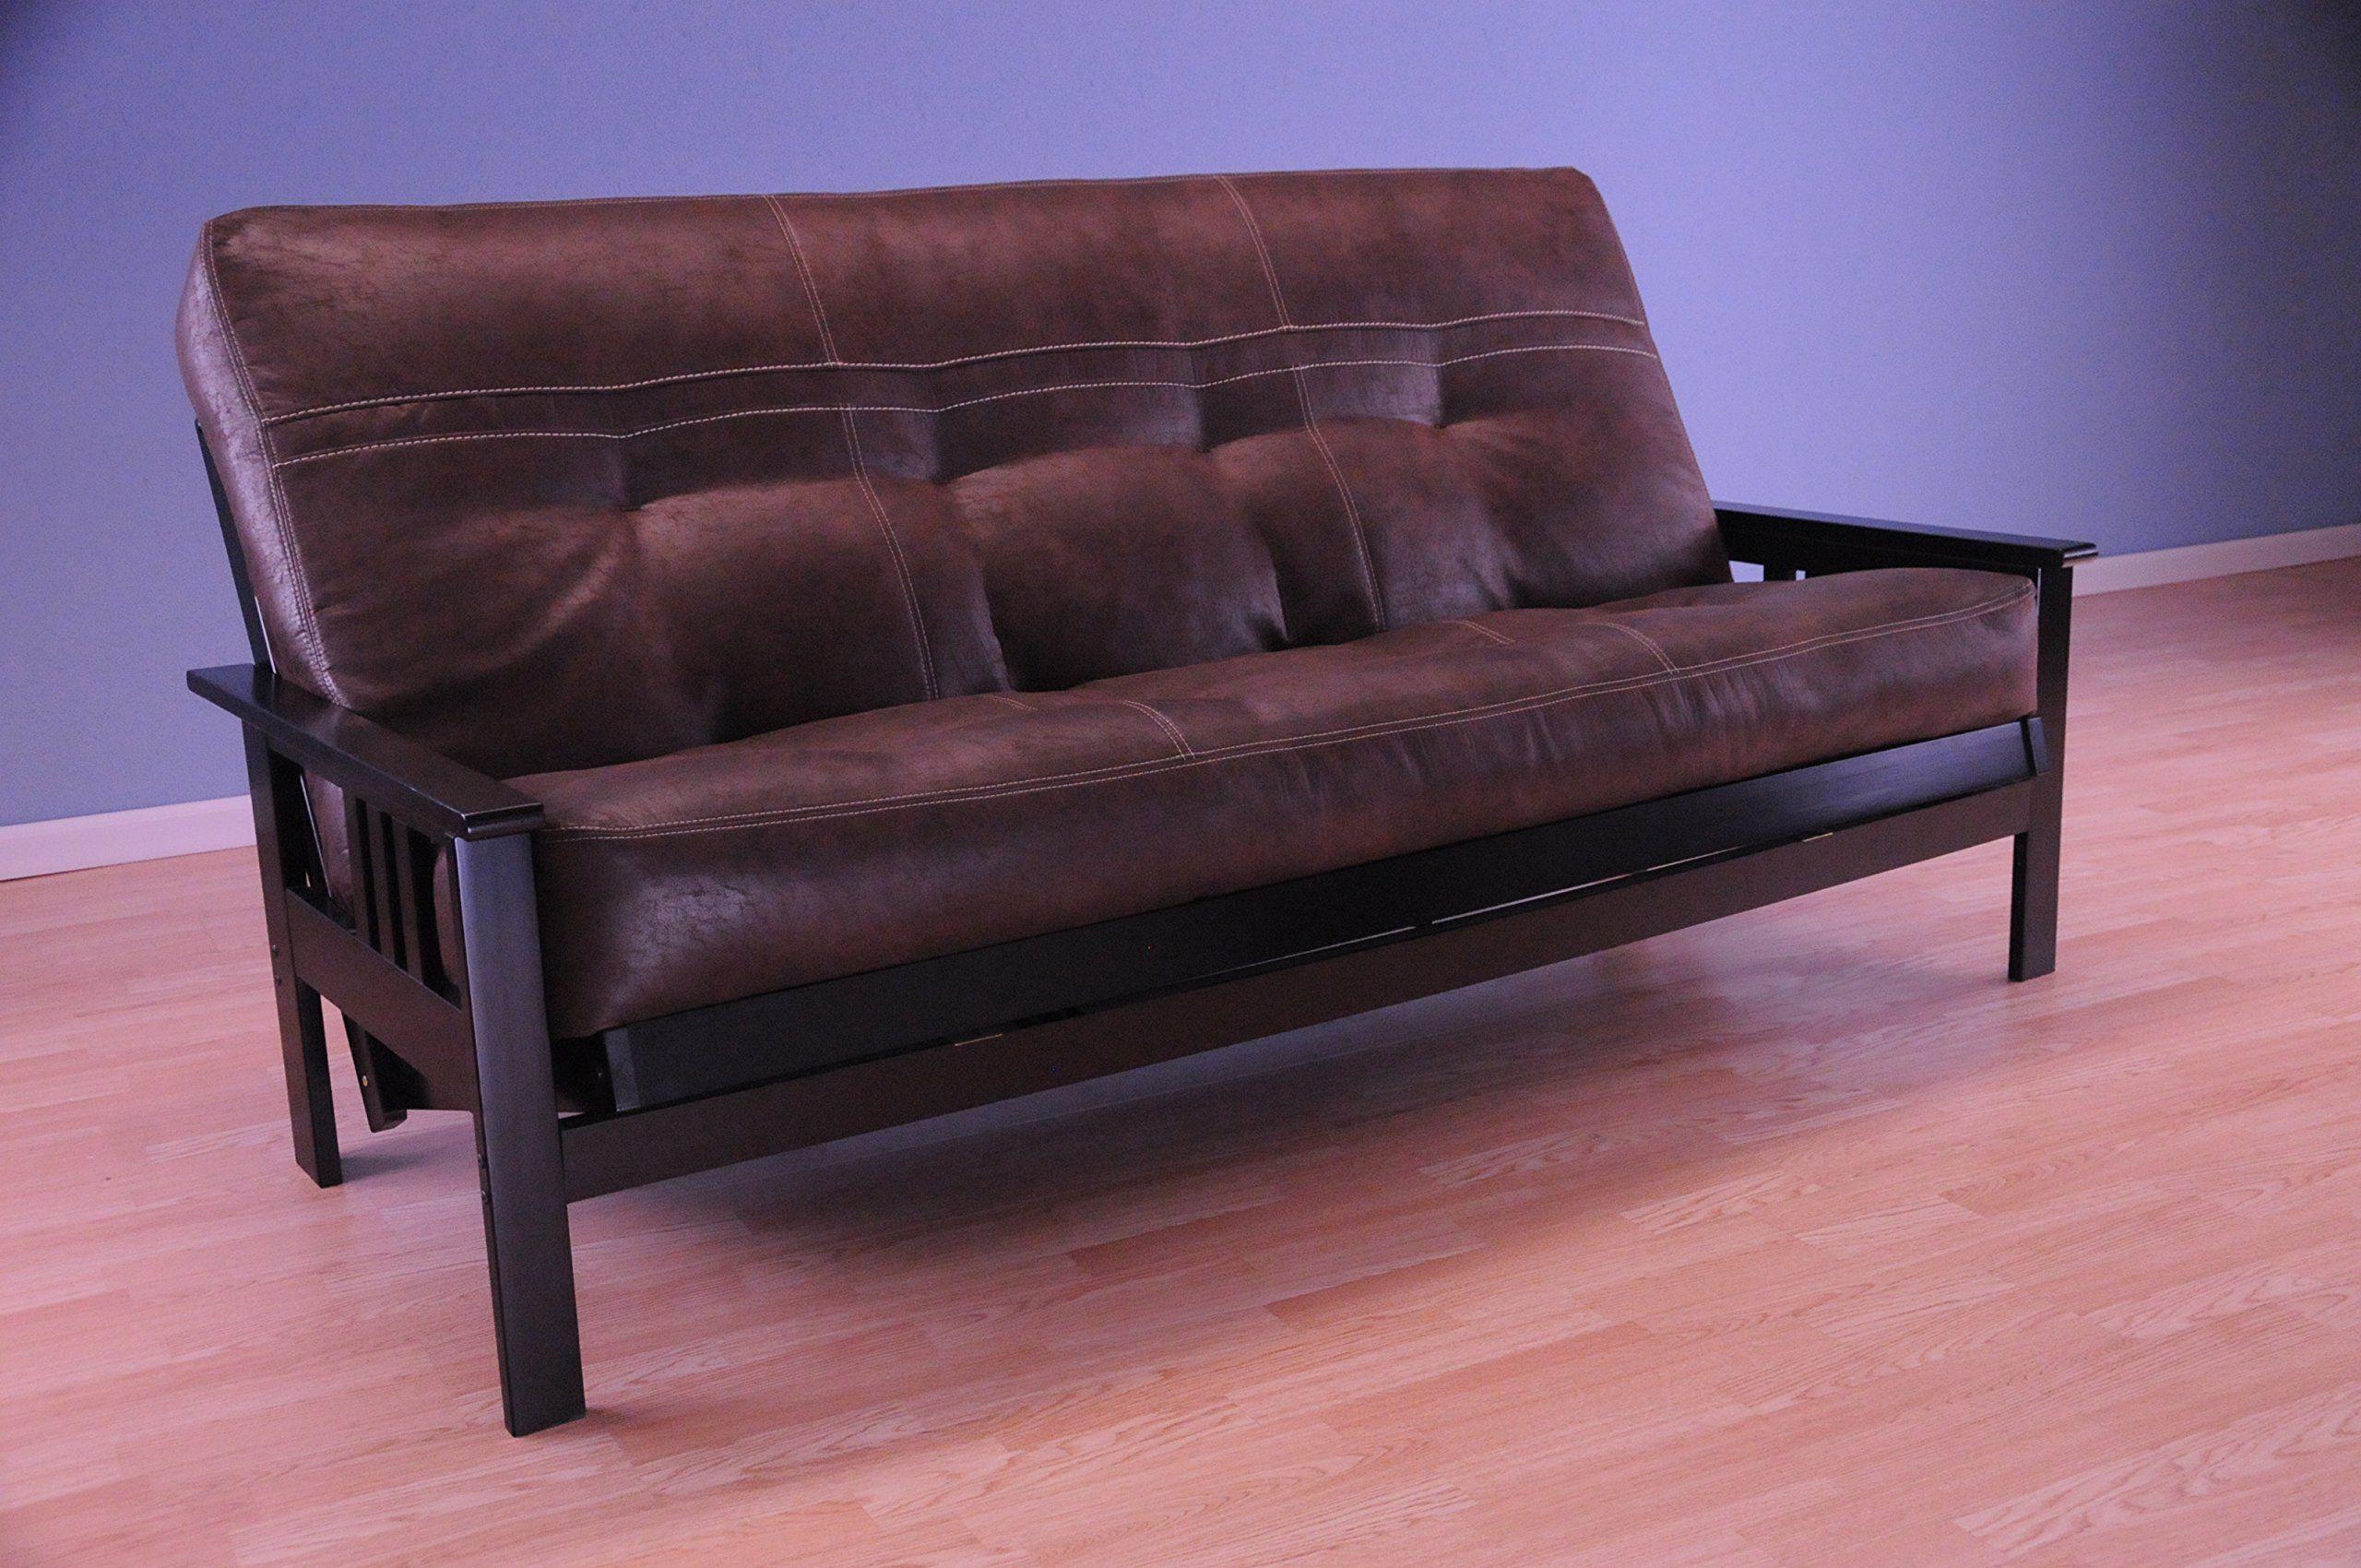 Kodiak Furniture Kfmobkpsbllf5md3 Monterey Futon Set With Black Finish Full Palance Sable Check Out